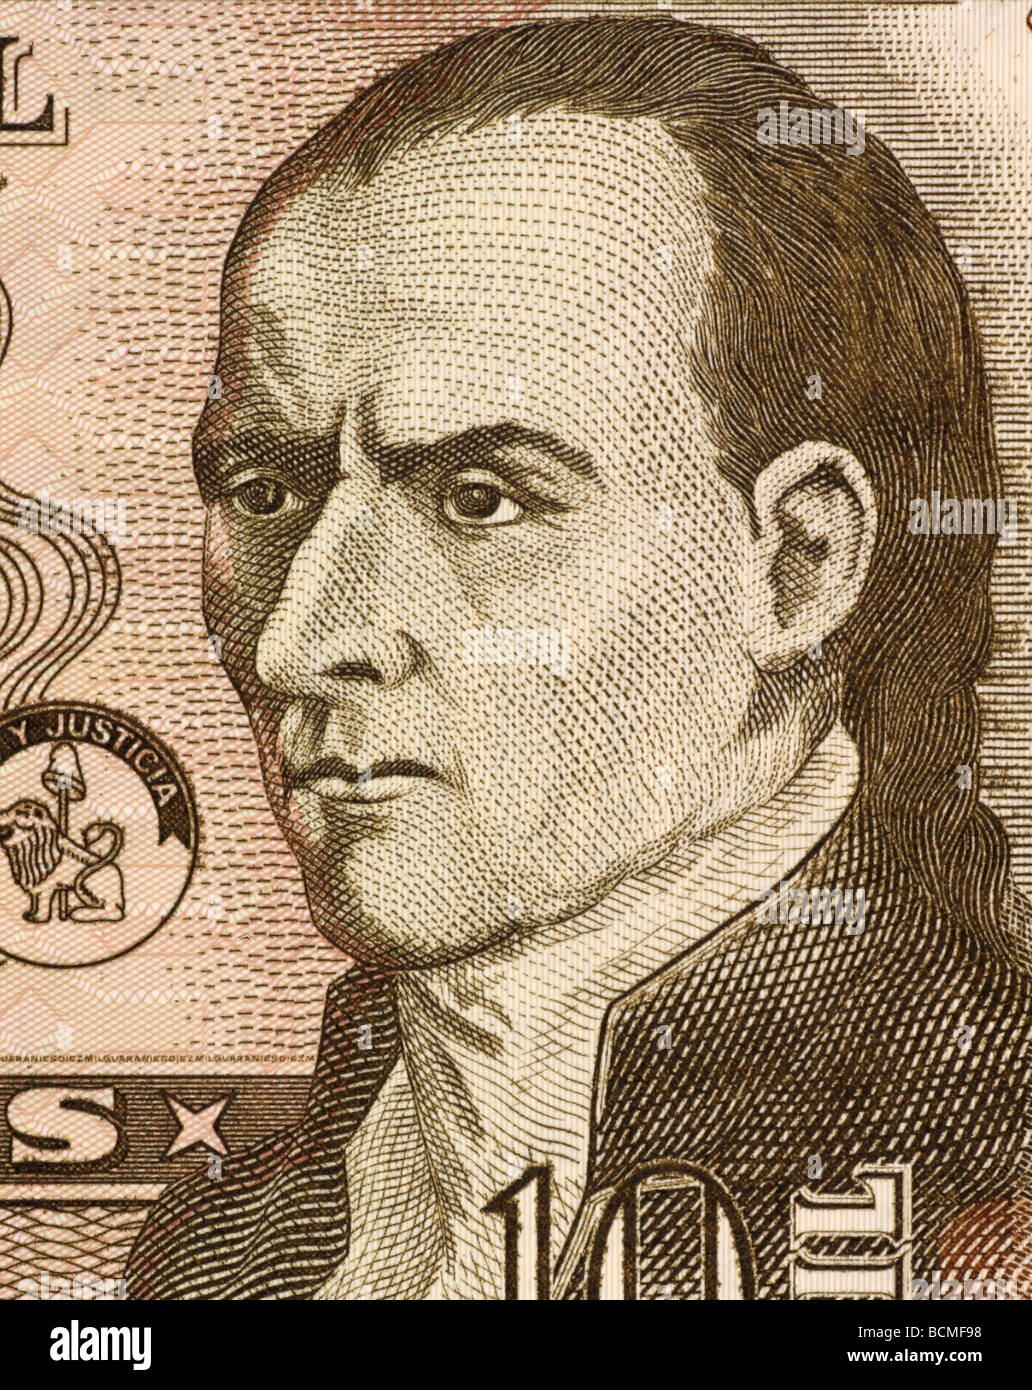 Il dottor José Gaspar Rodriguez de Francia su 10000 Guaranies 2004 banconota dal Paraguay Immagini Stock